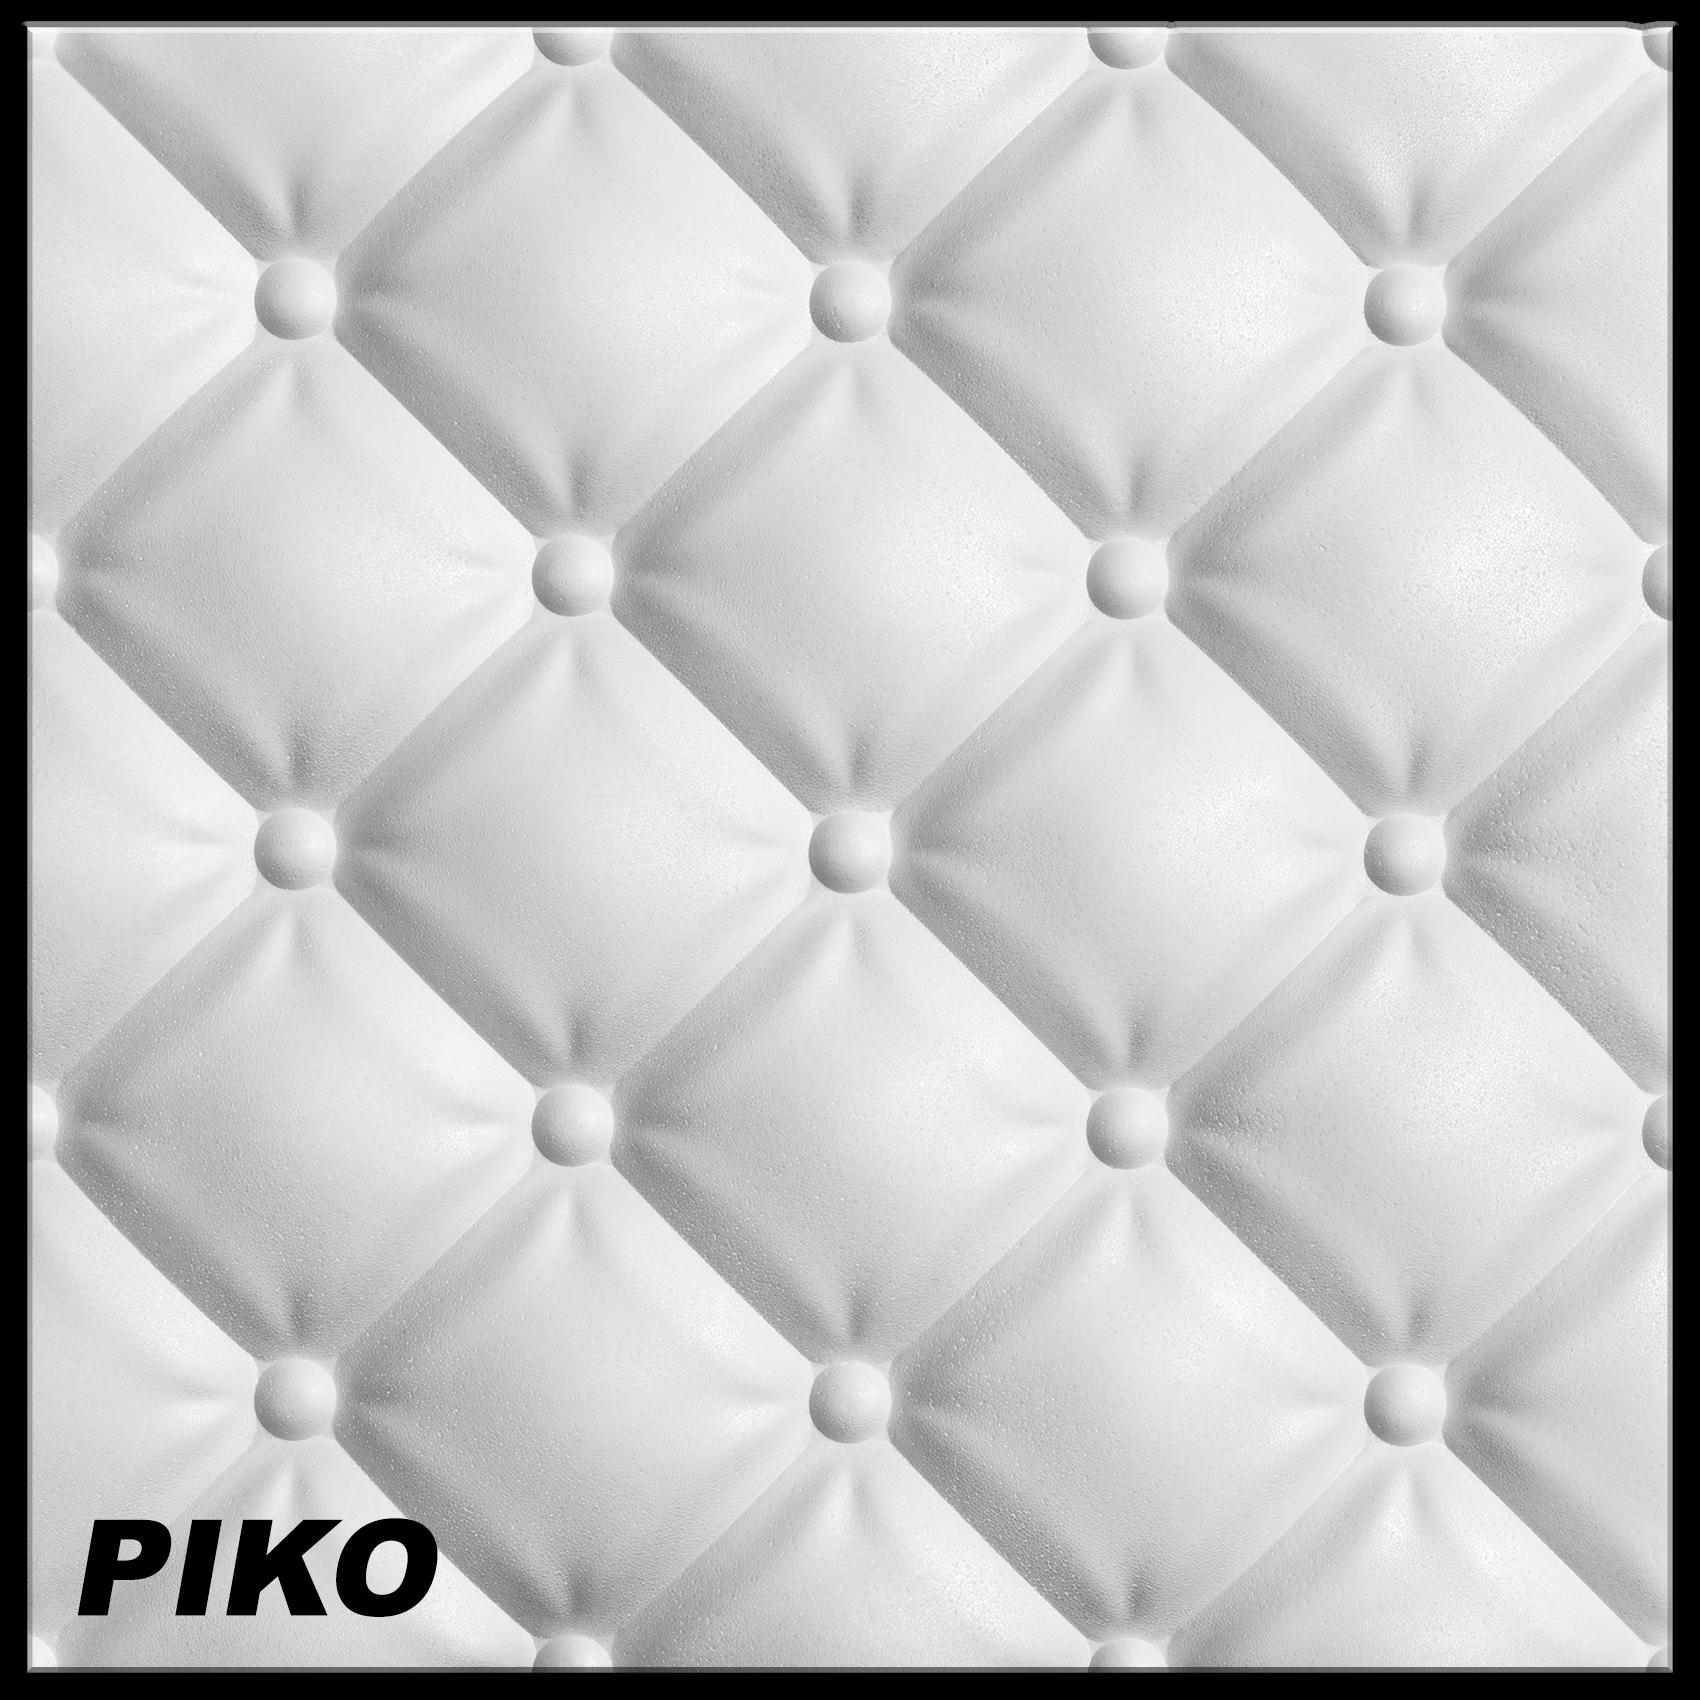 1 platte 3d polystyrol wand decke paneele dekor wandverkleidung 60x60cm piko ebay. Black Bedroom Furniture Sets. Home Design Ideas